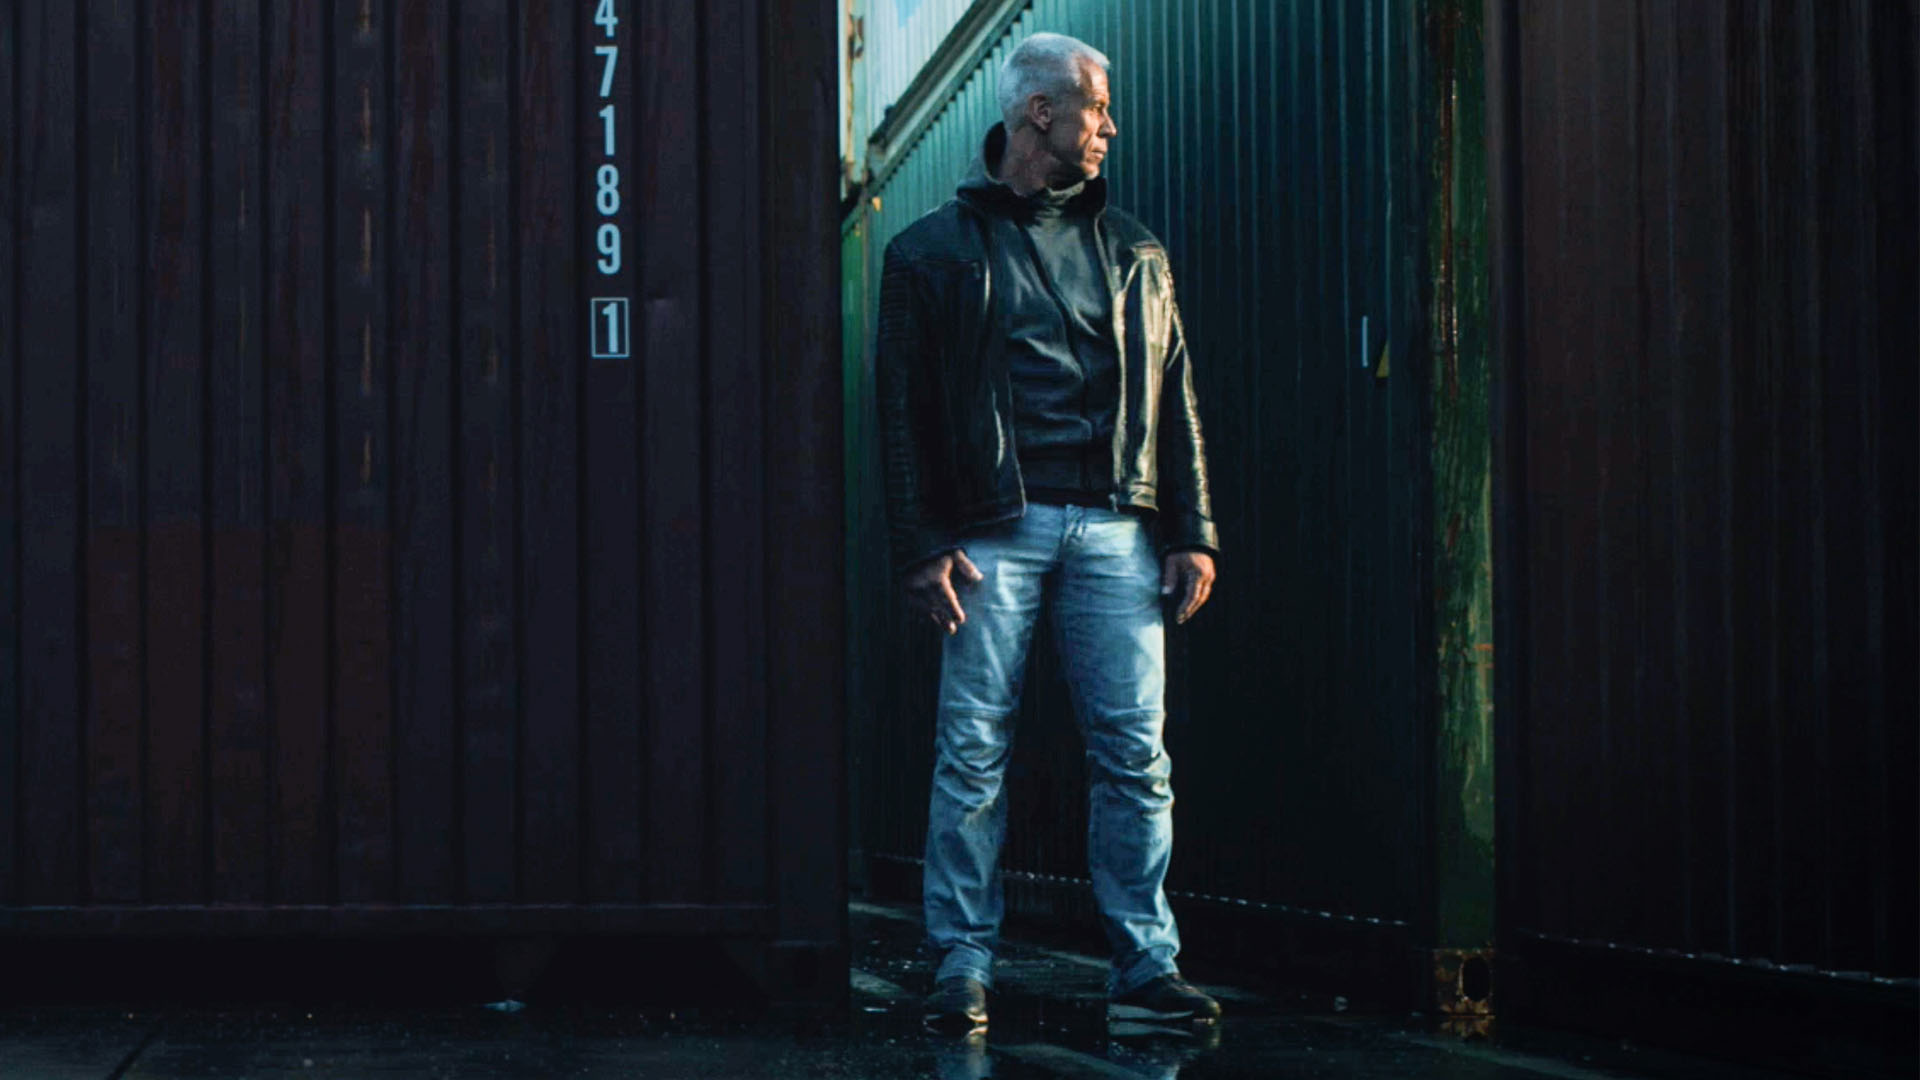 Peter vor Frachtcontainer